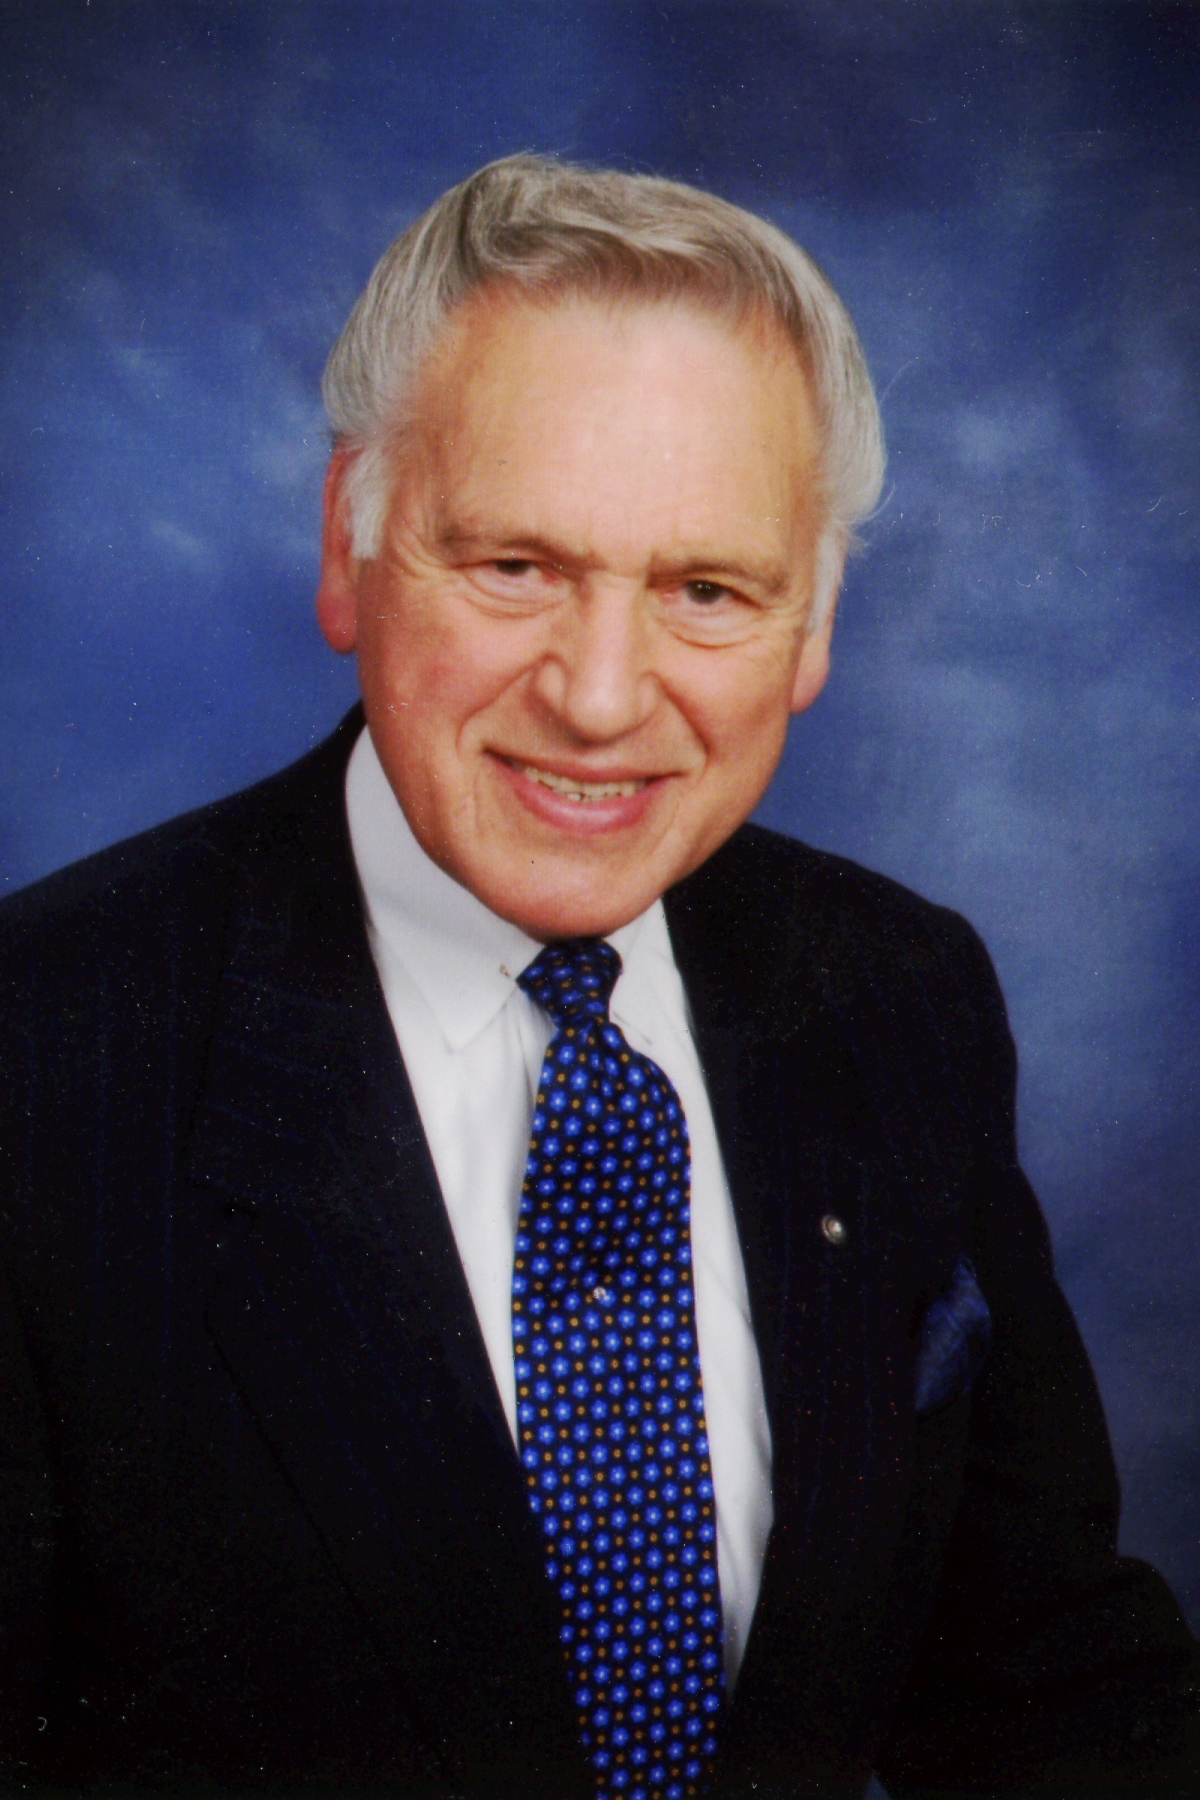 The Rev. Mouzon Biggs